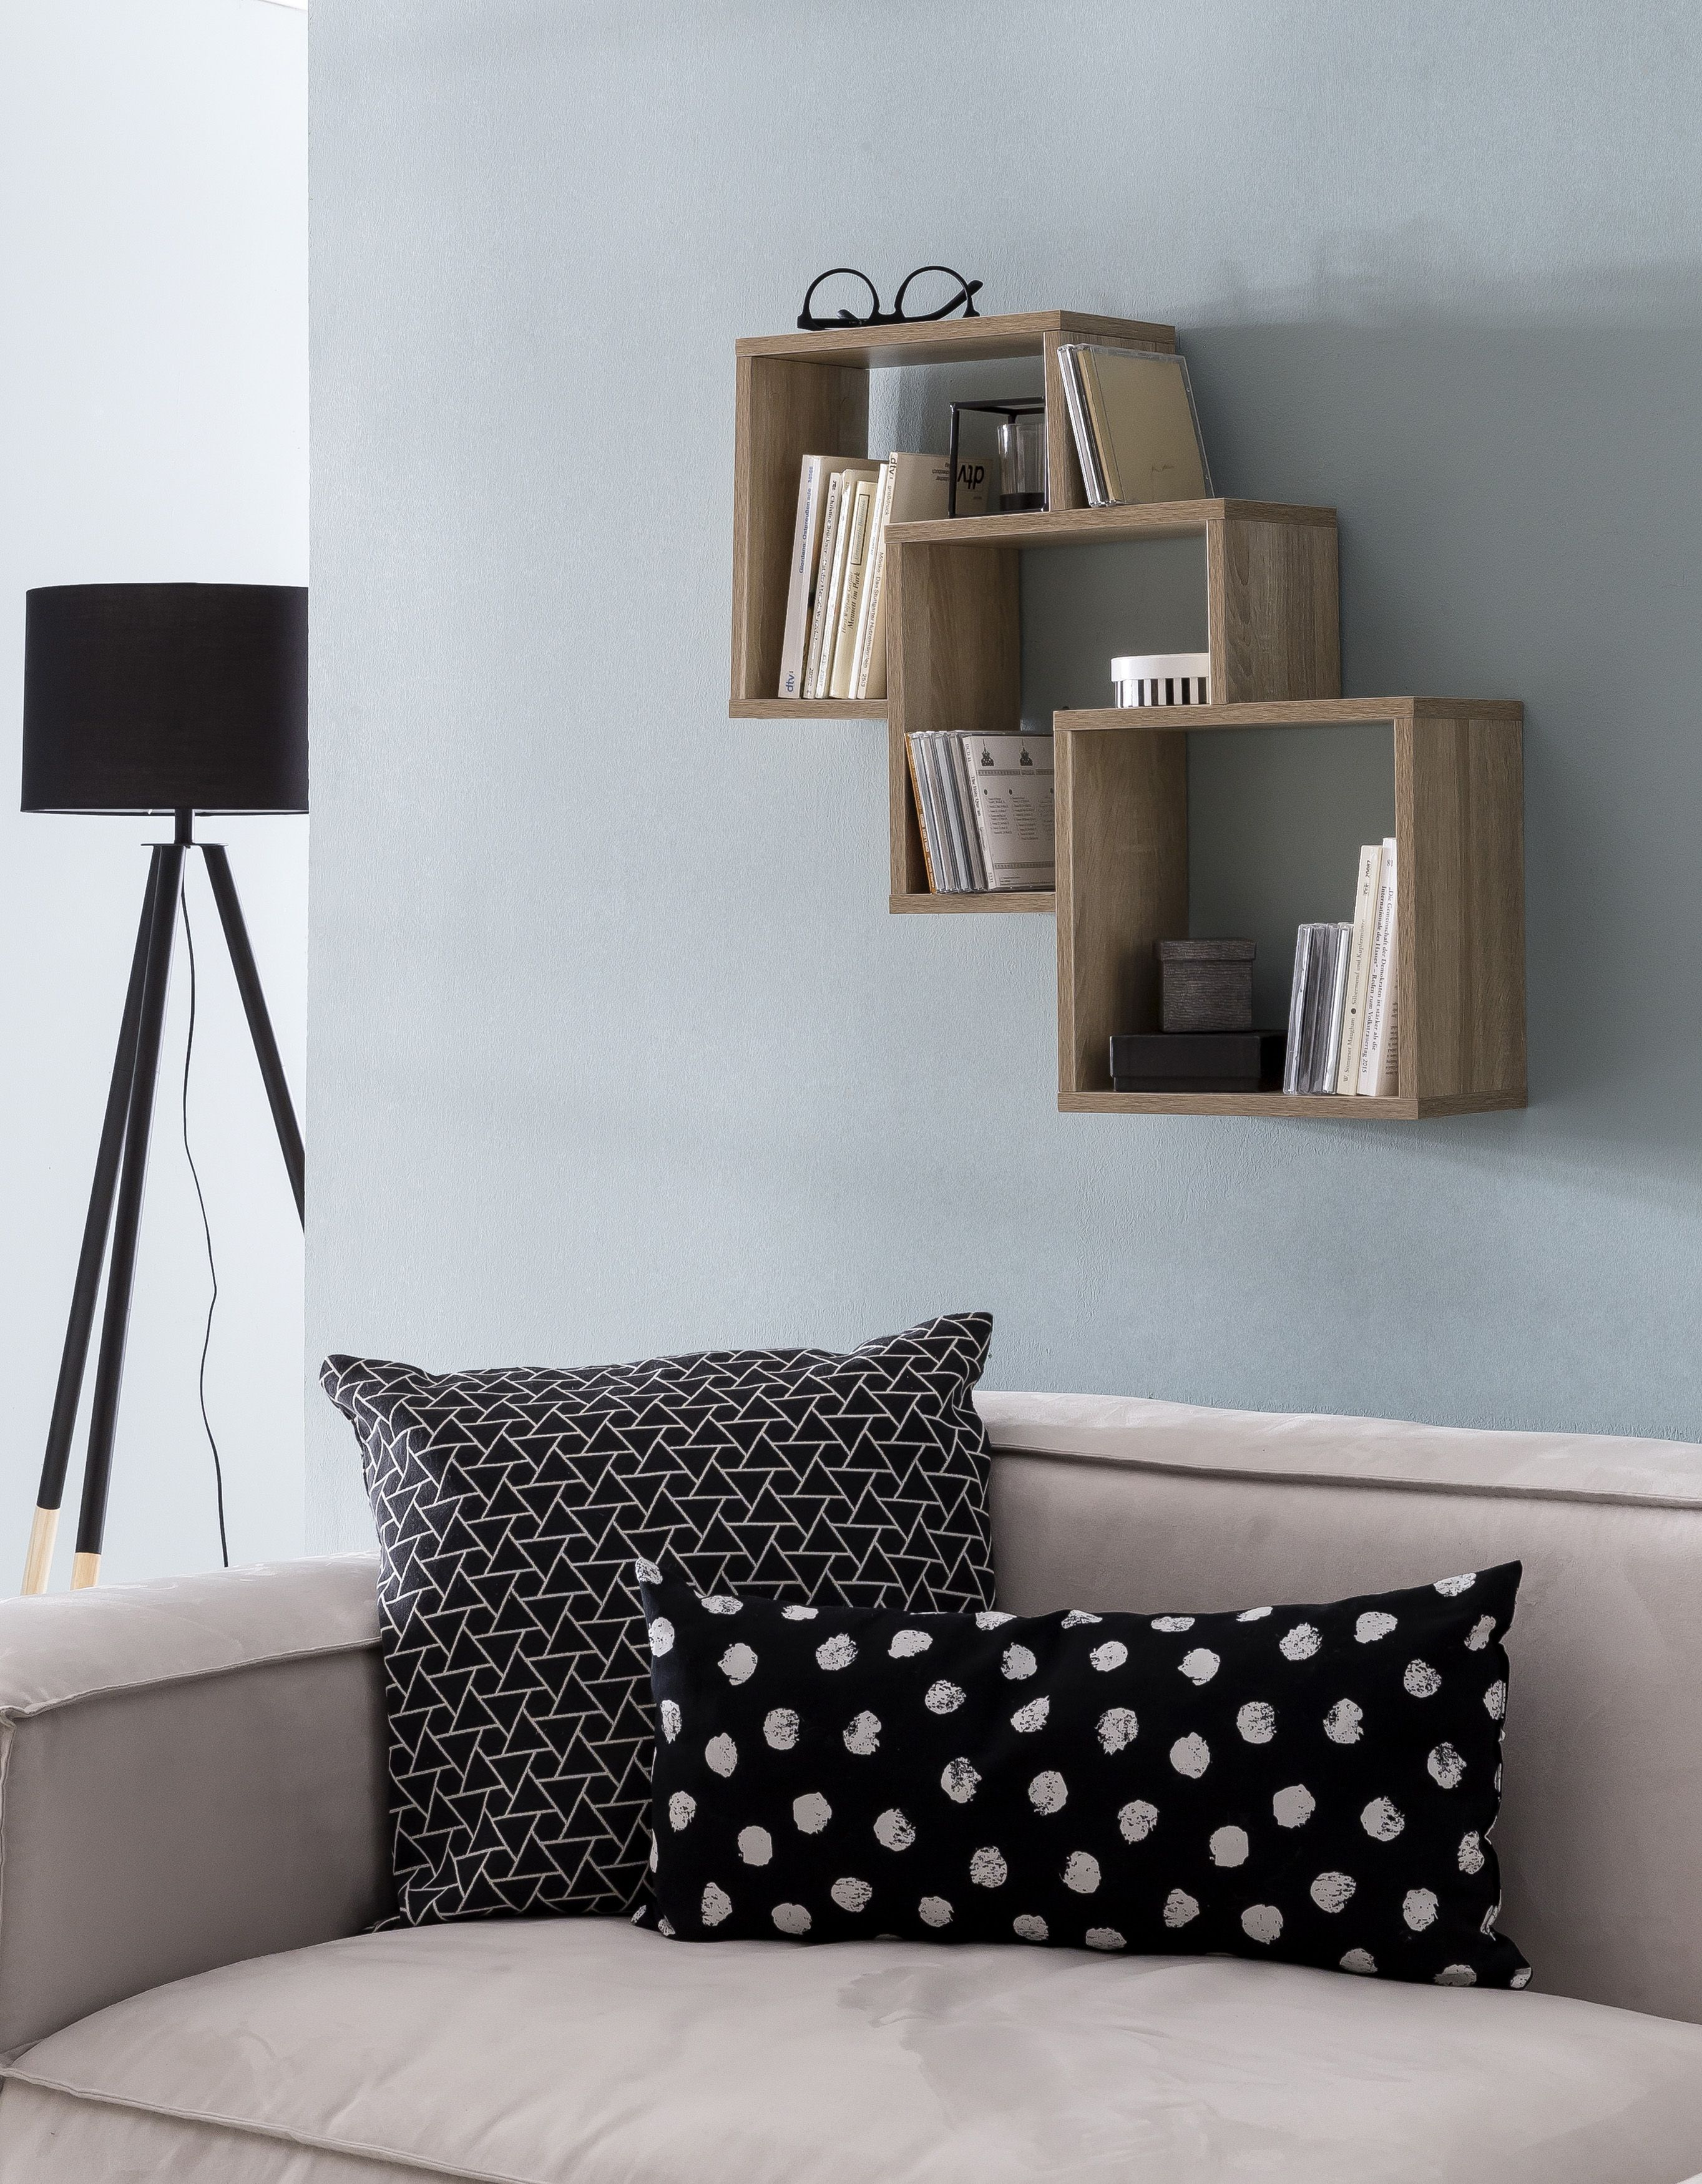 Hangeregal Wand Regal E Schwebend Cube Quadrat Deko Holzwurfel